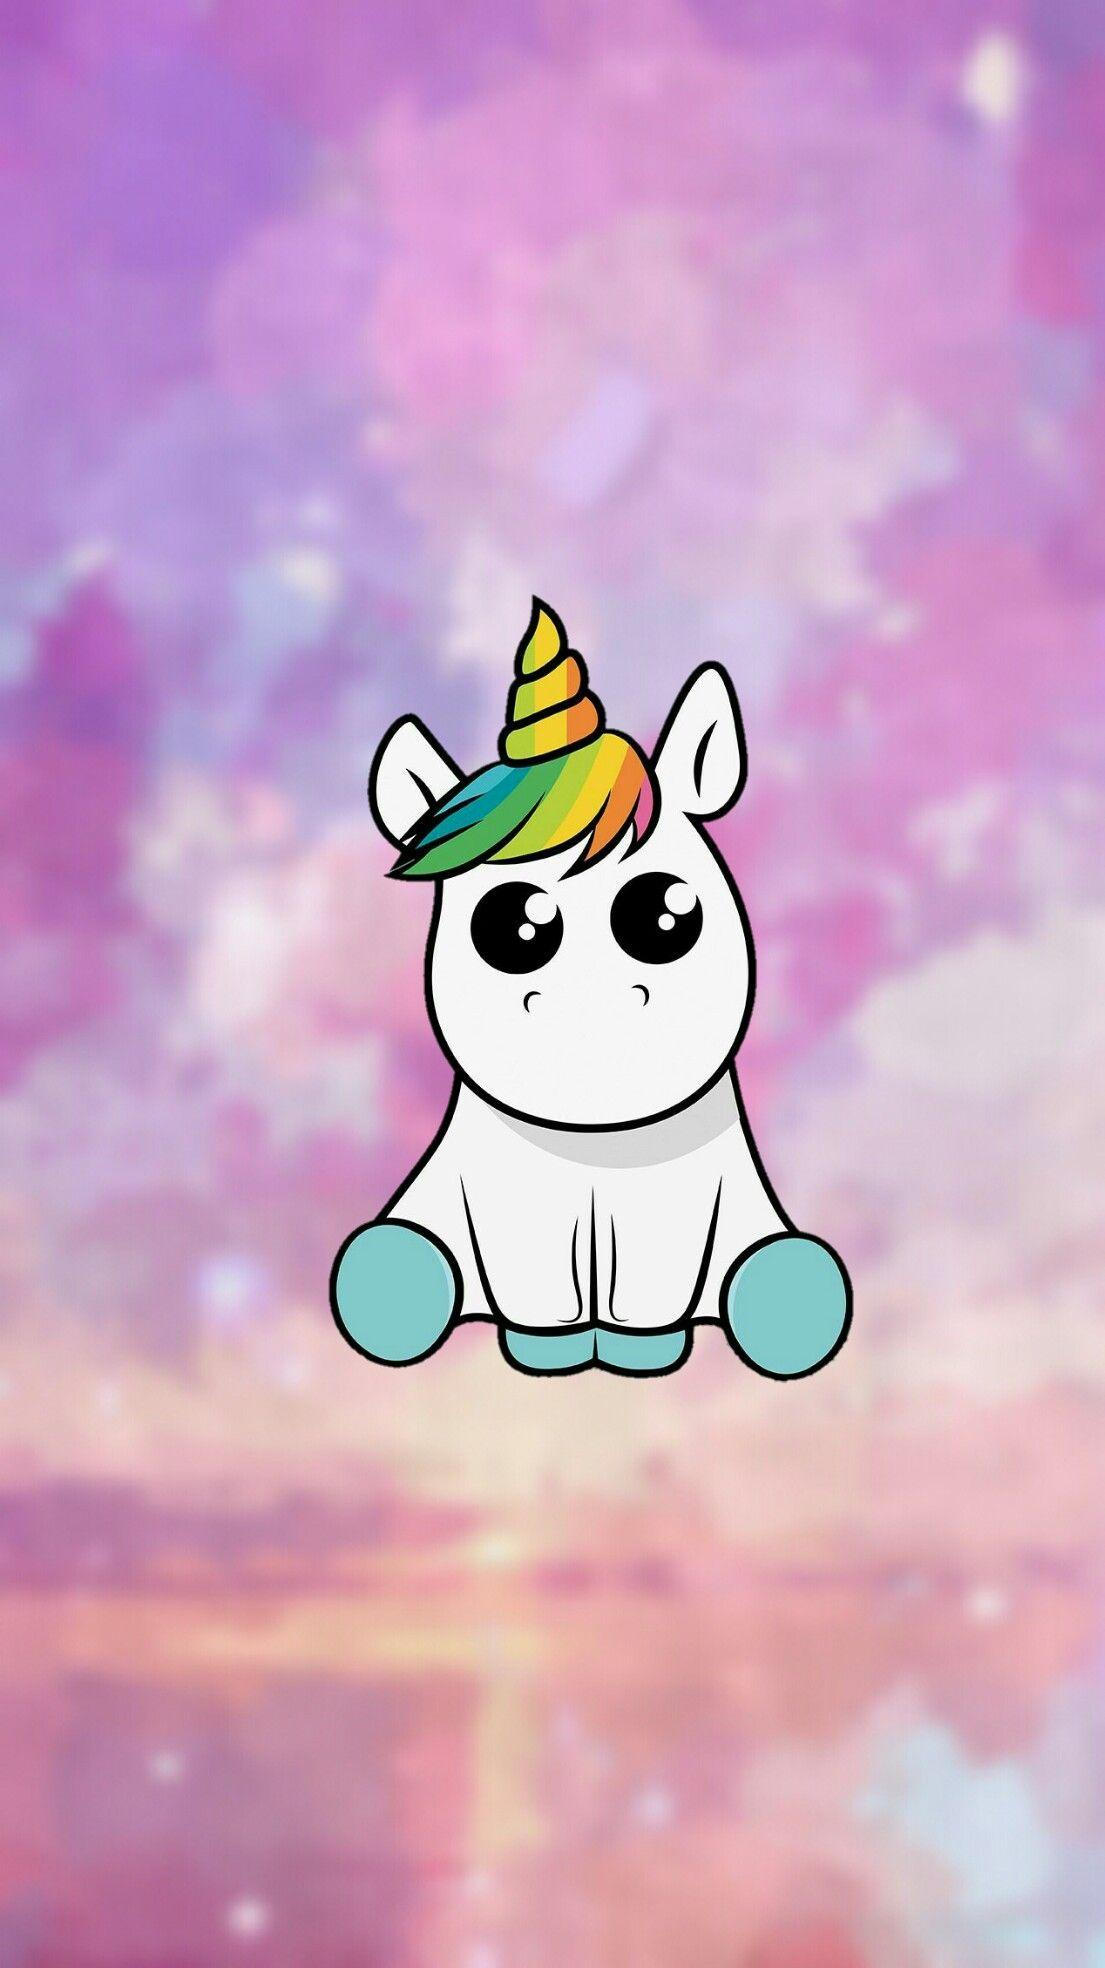 Unicorn Wallpaper For Ipad